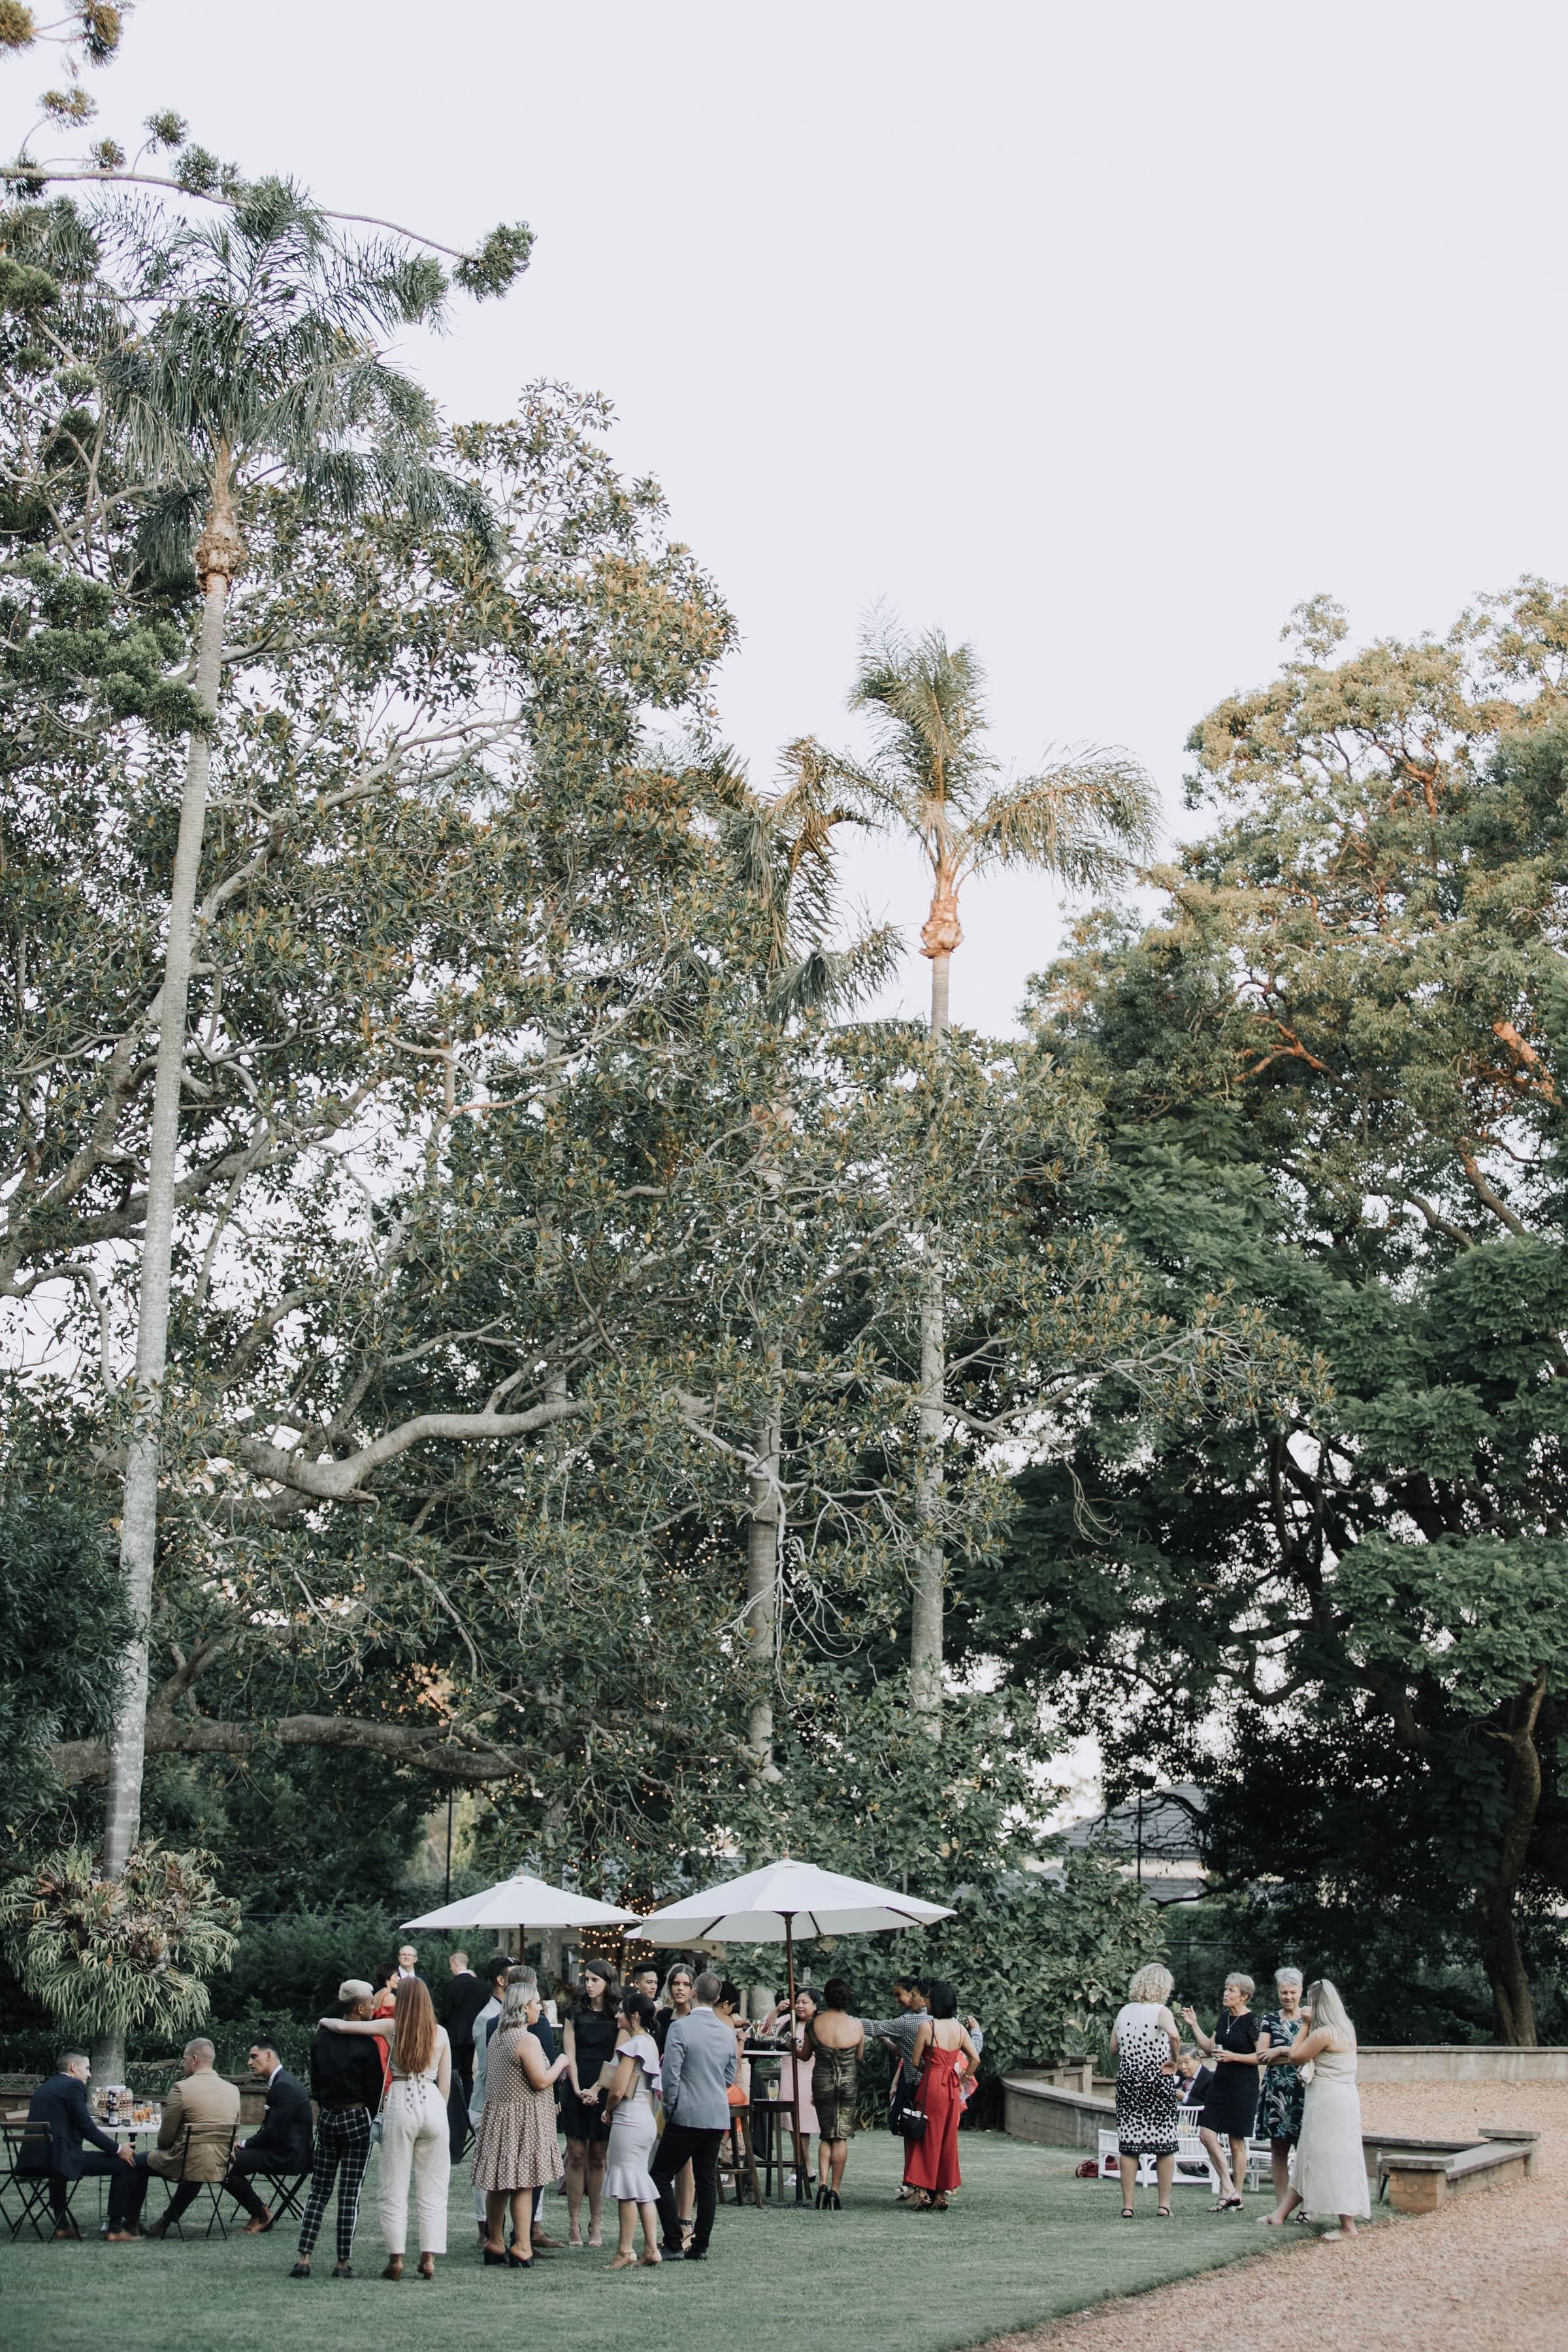 Garden party under big palm trees